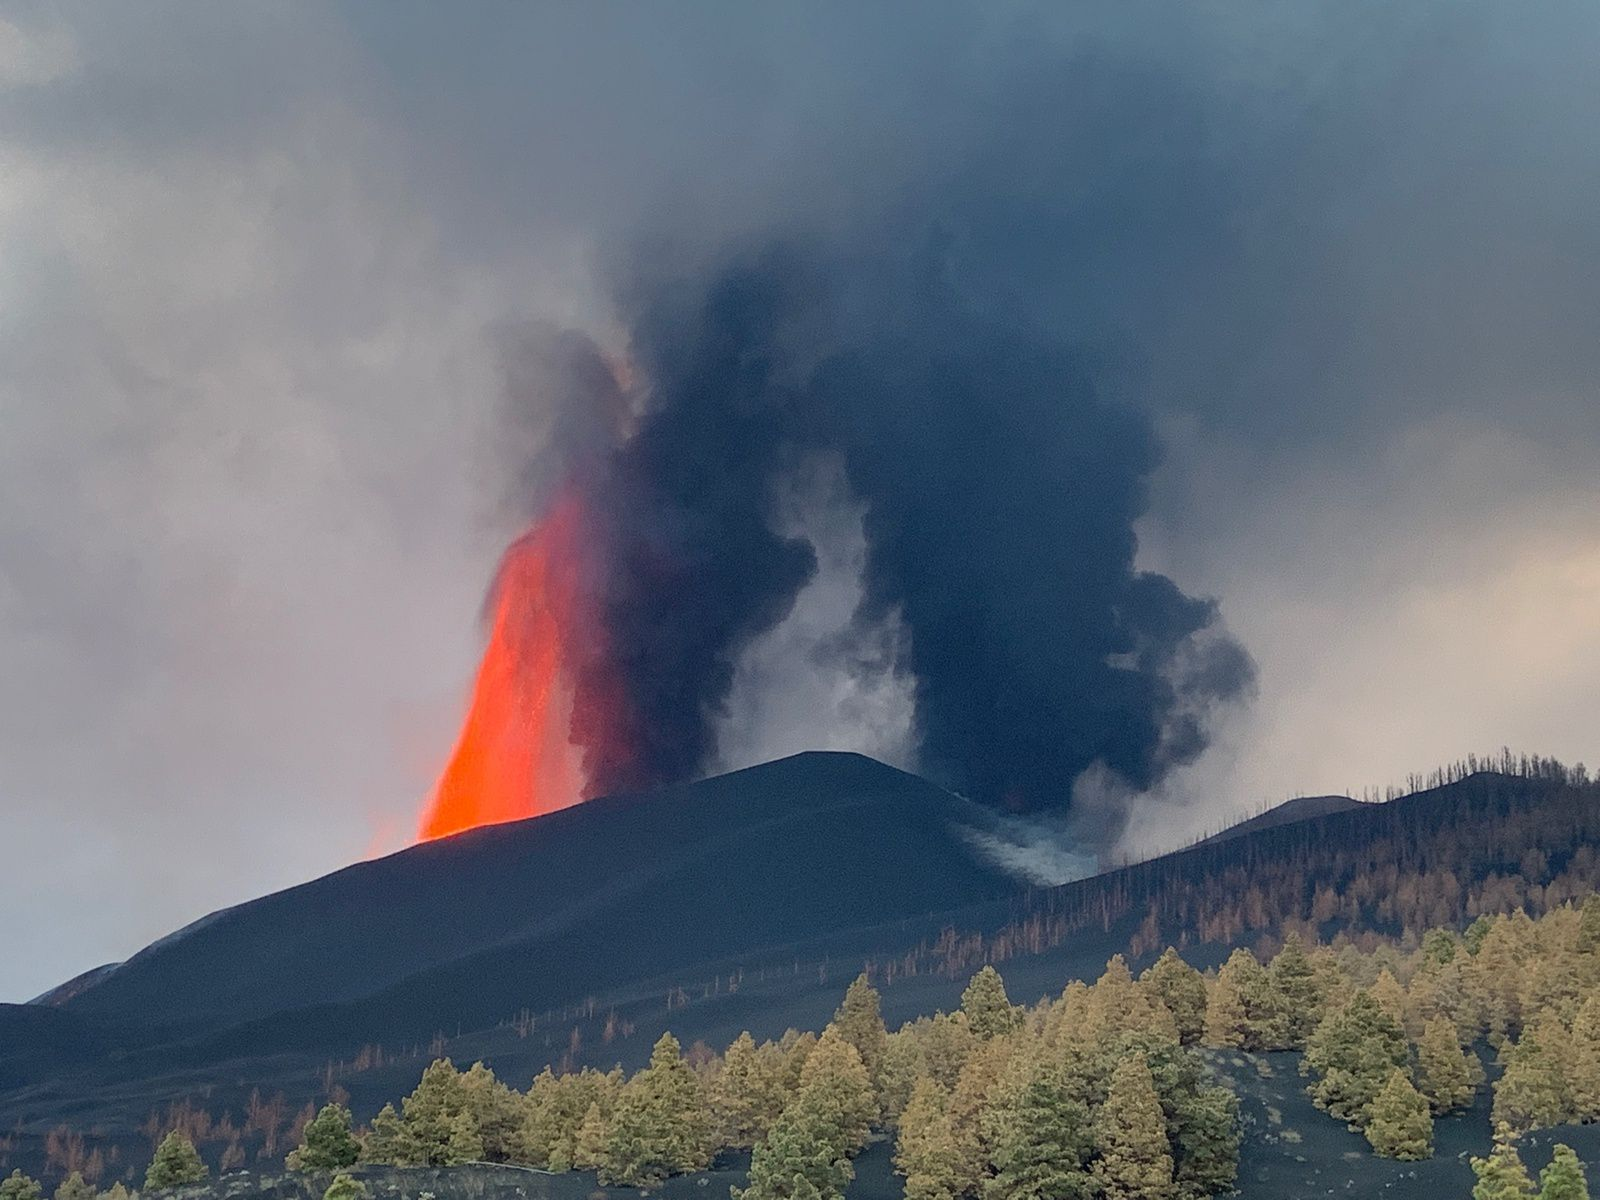 La Palma / Cumbre Vieja - fountaining activity on 11.10.2021 - Doc. LMU_Volc